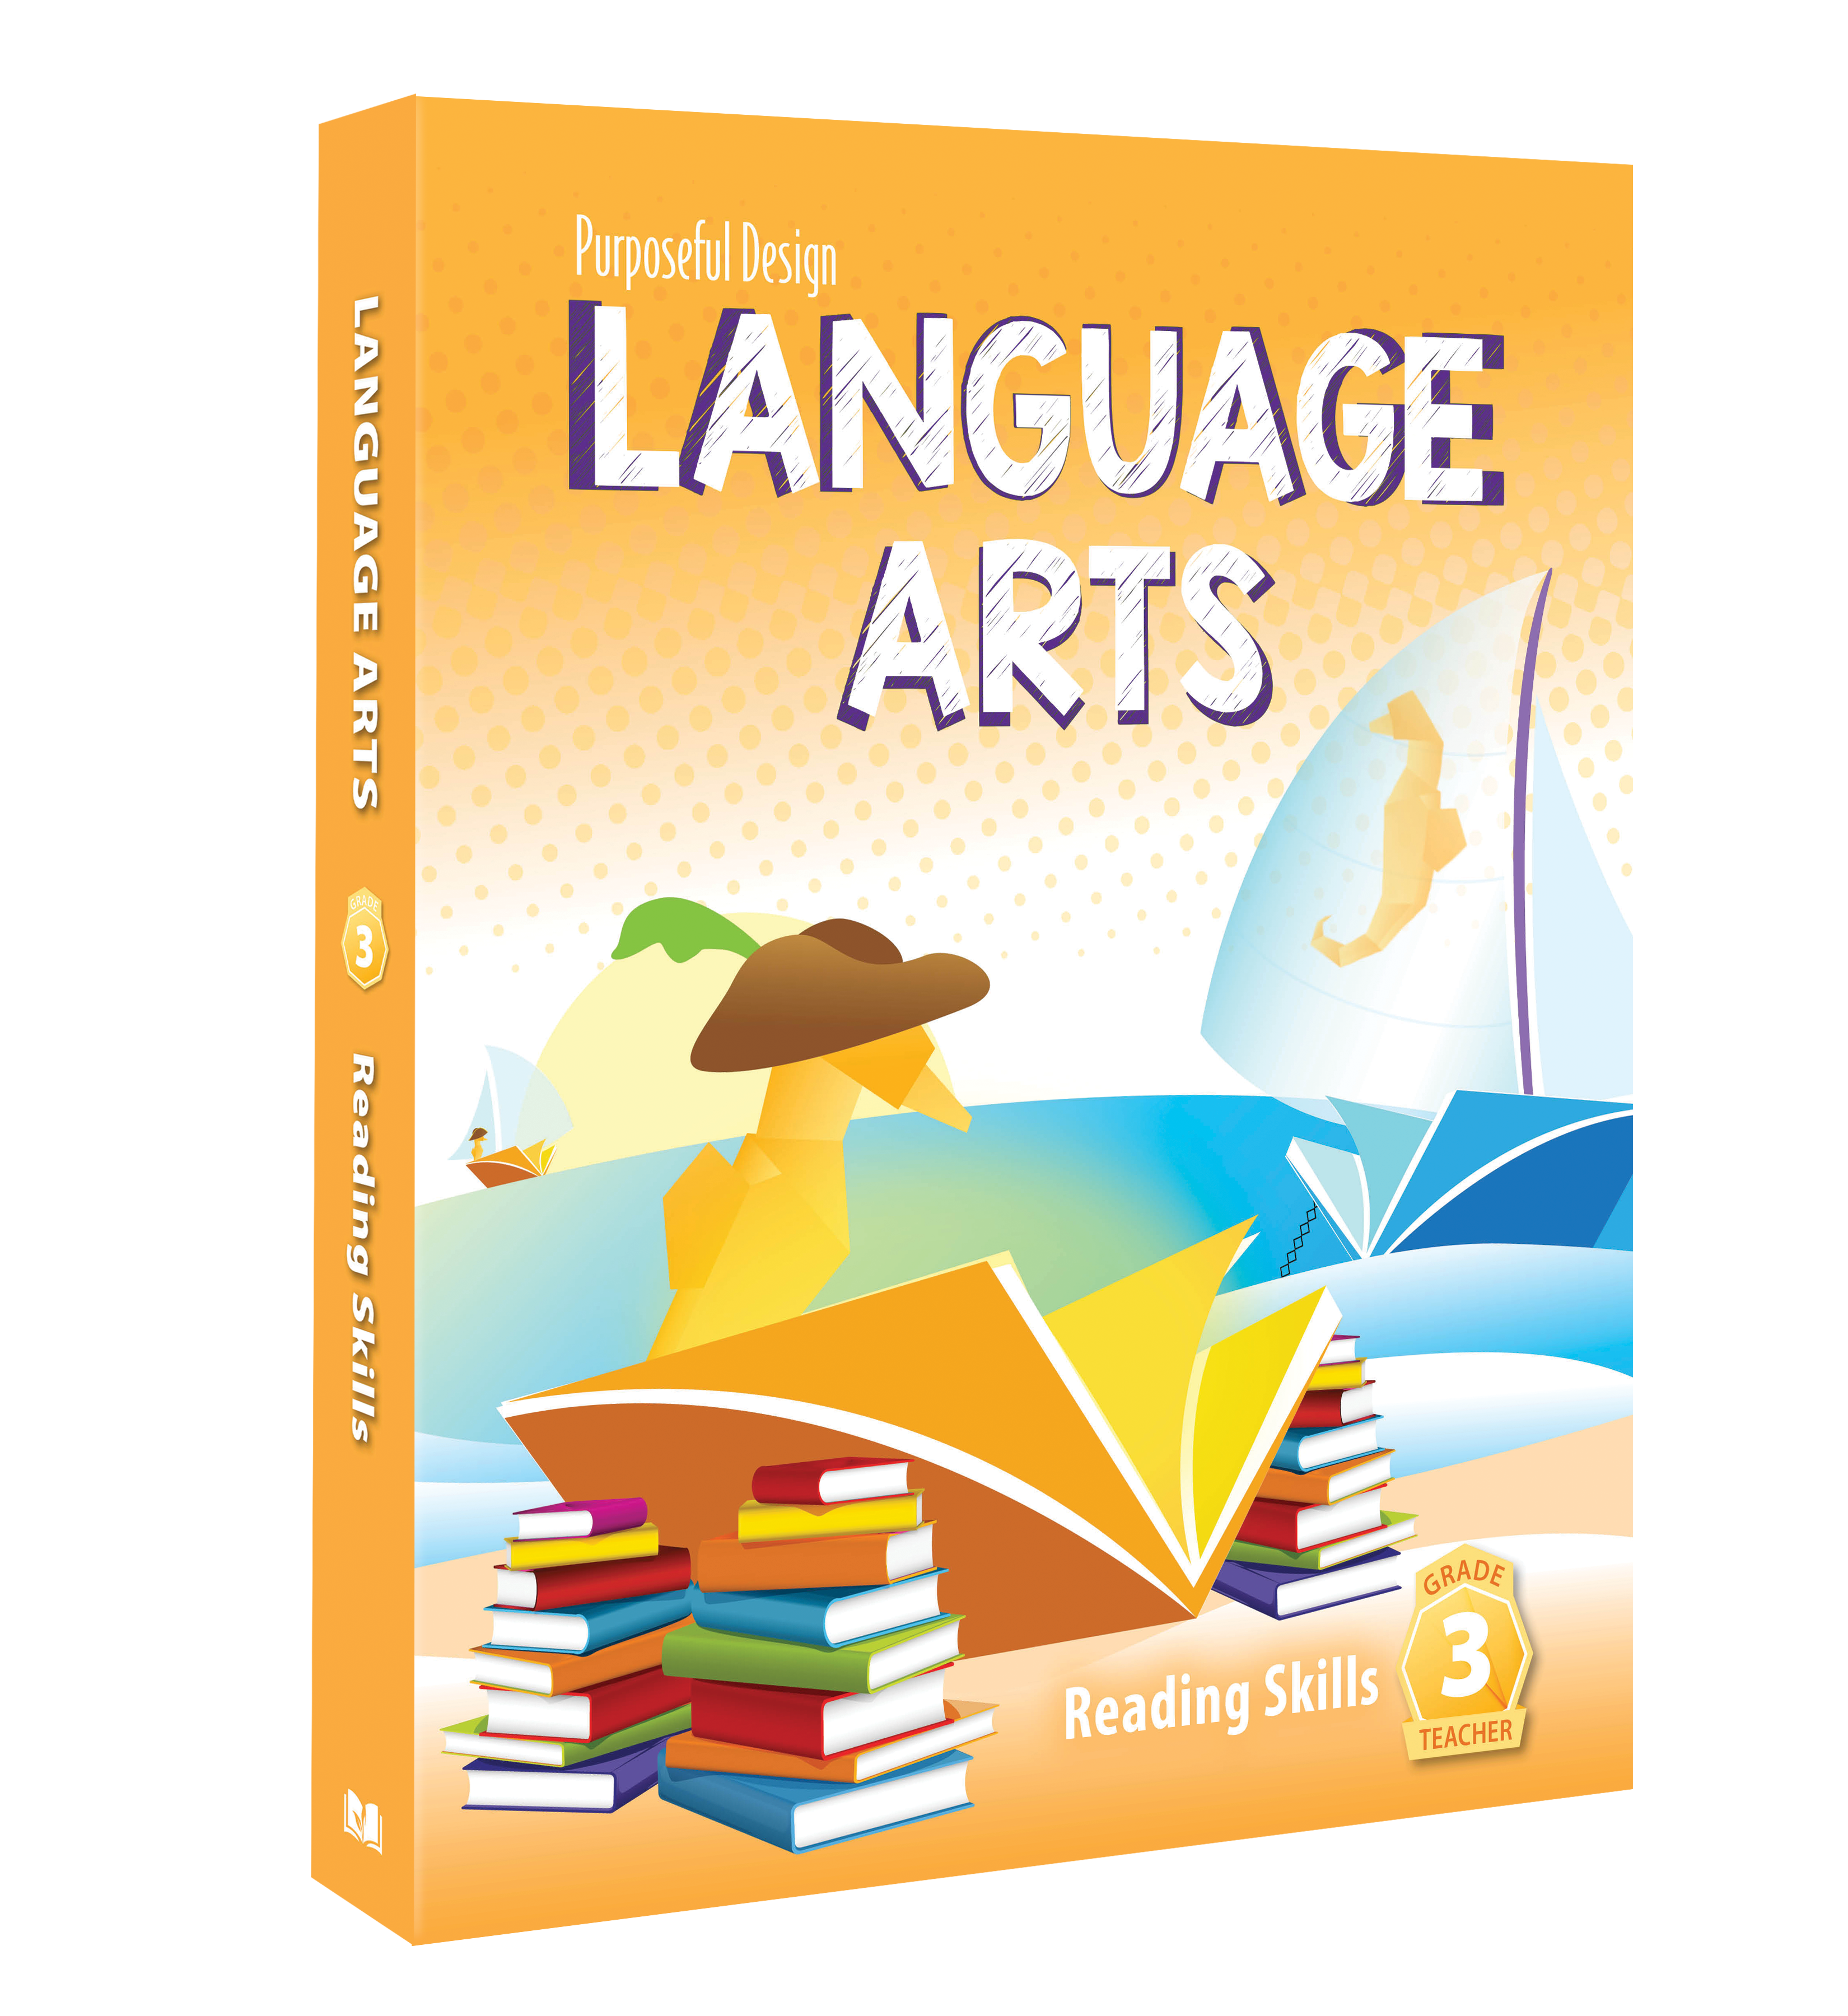 PDP Language Arts:  Grade 3 Reading Skills Student Edition